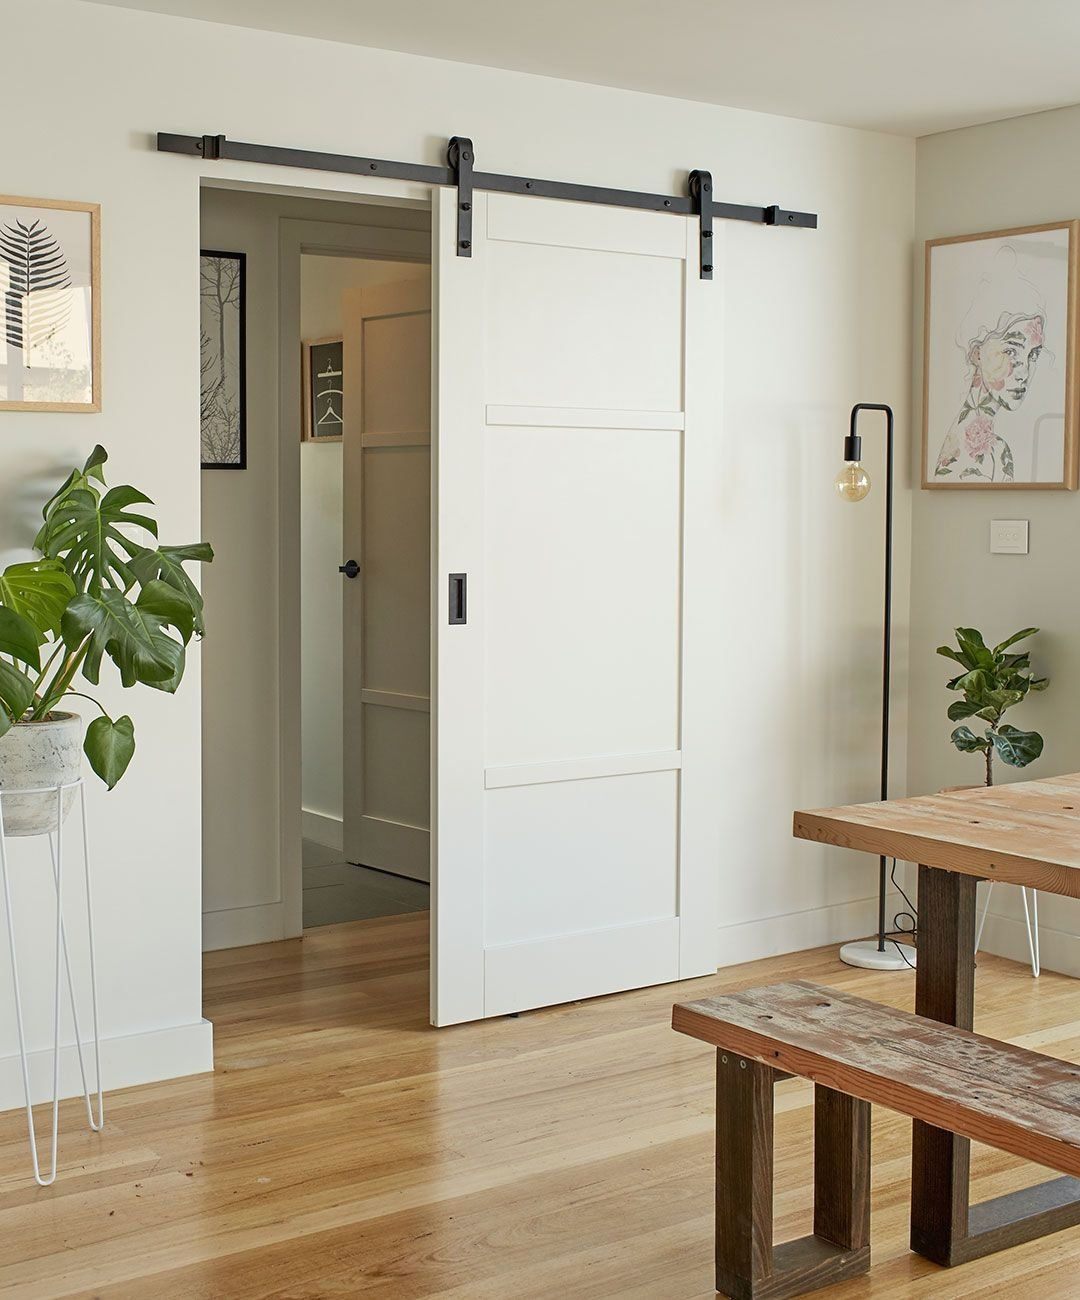 Door Window Gate Hardware Fly Screens At Bunnings Warehouse 1000 In 2020 Barn Style Sliding Doors Barn Style Doors Home